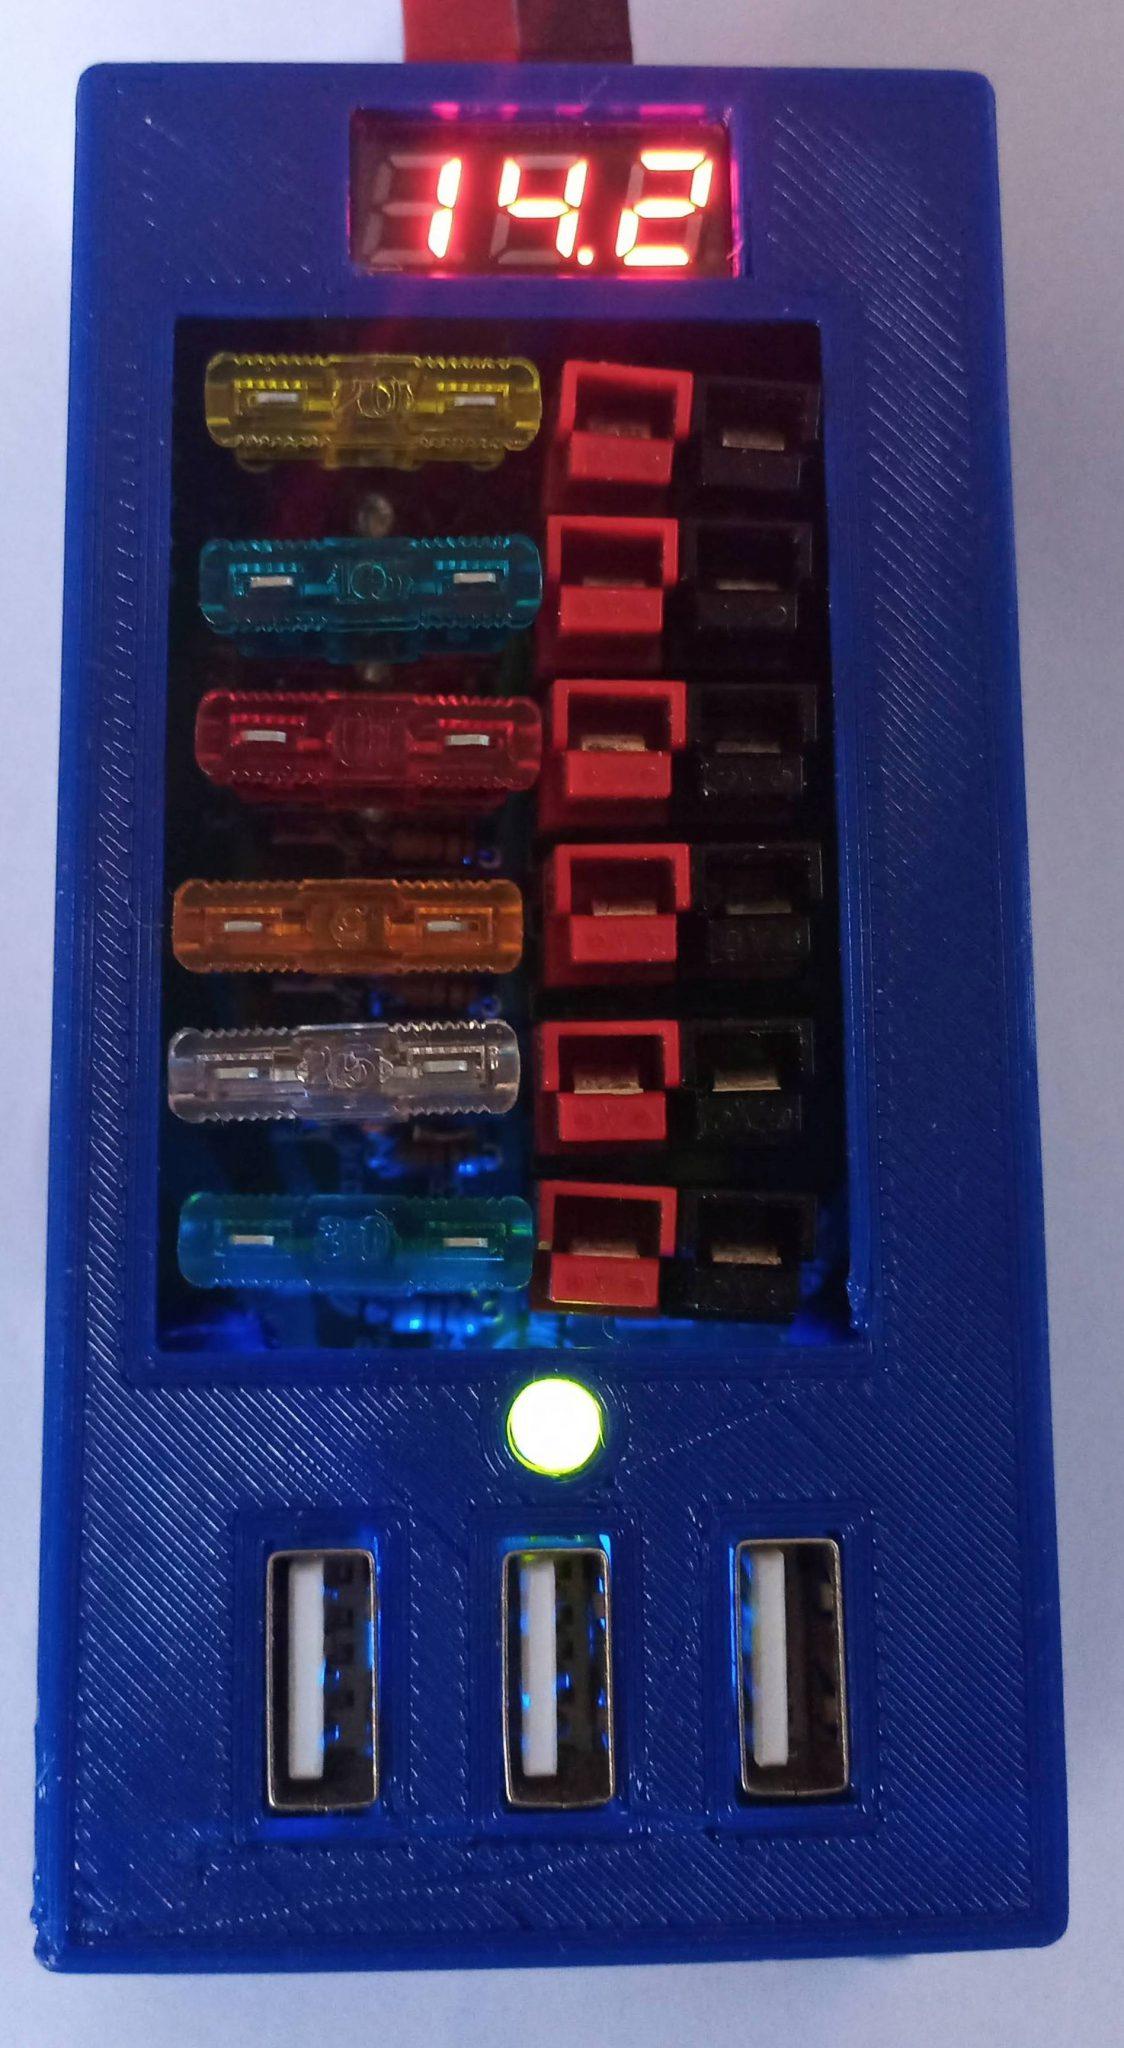 3 x USB Upgrade for WARS PPL KIT